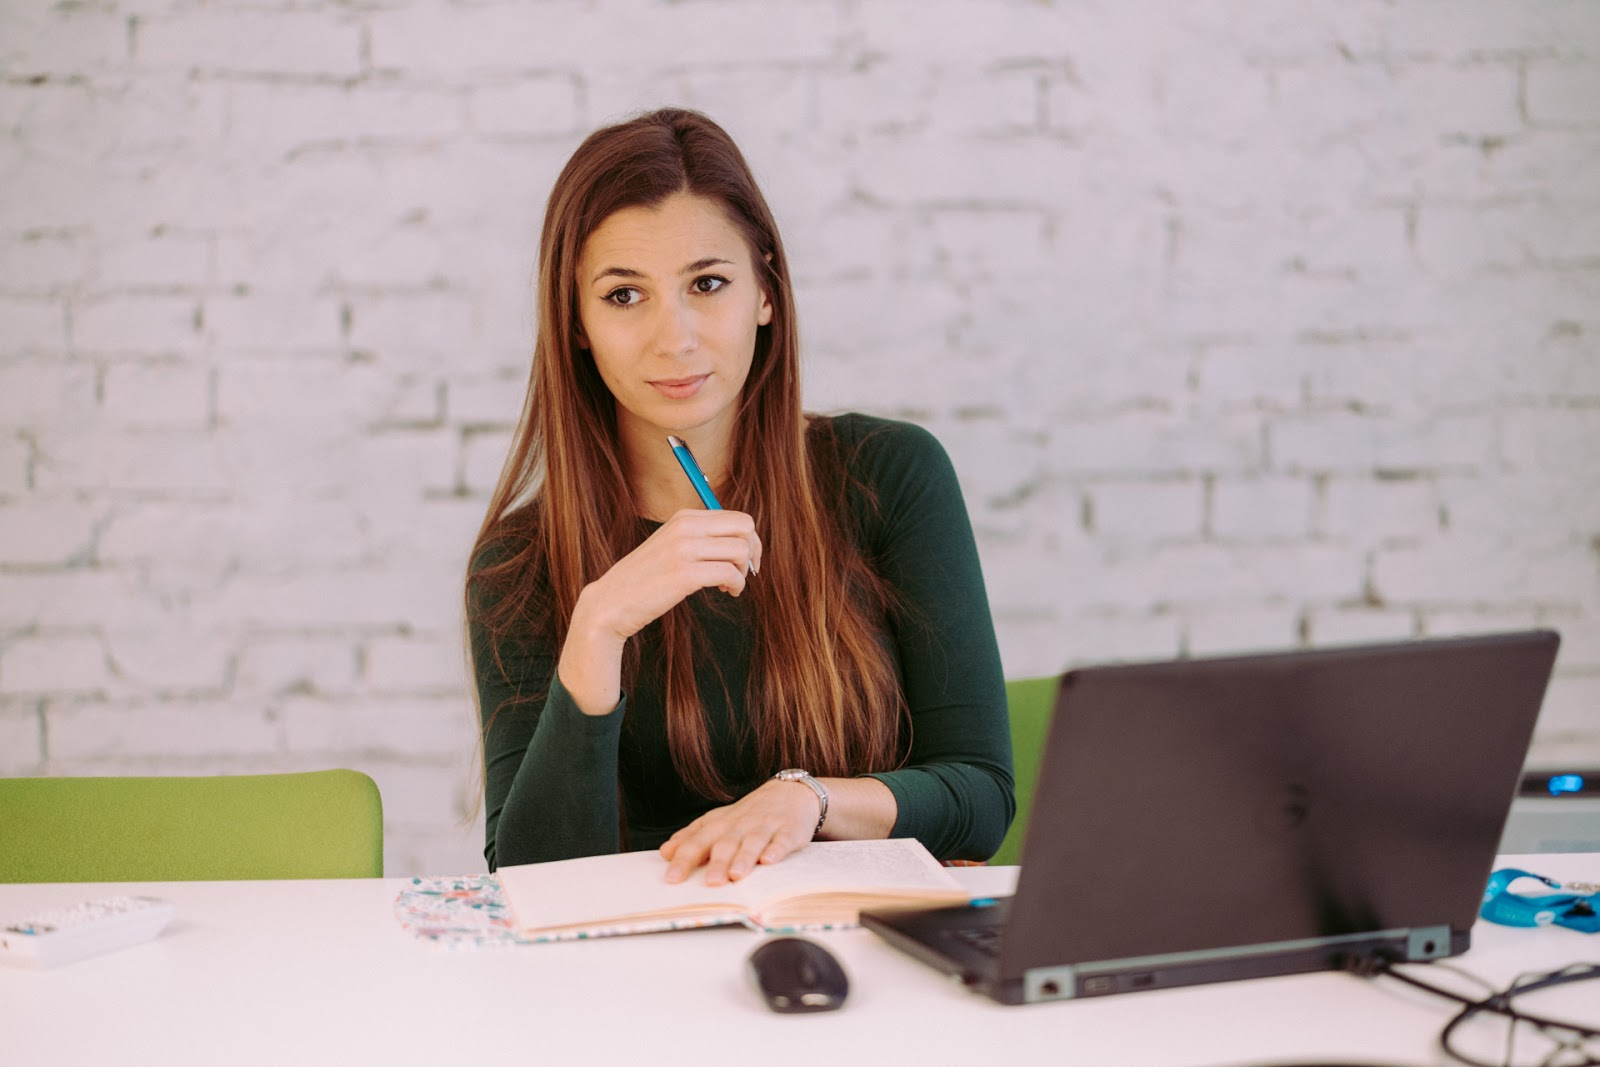 Natalia Urbańska, HR Director at Divante